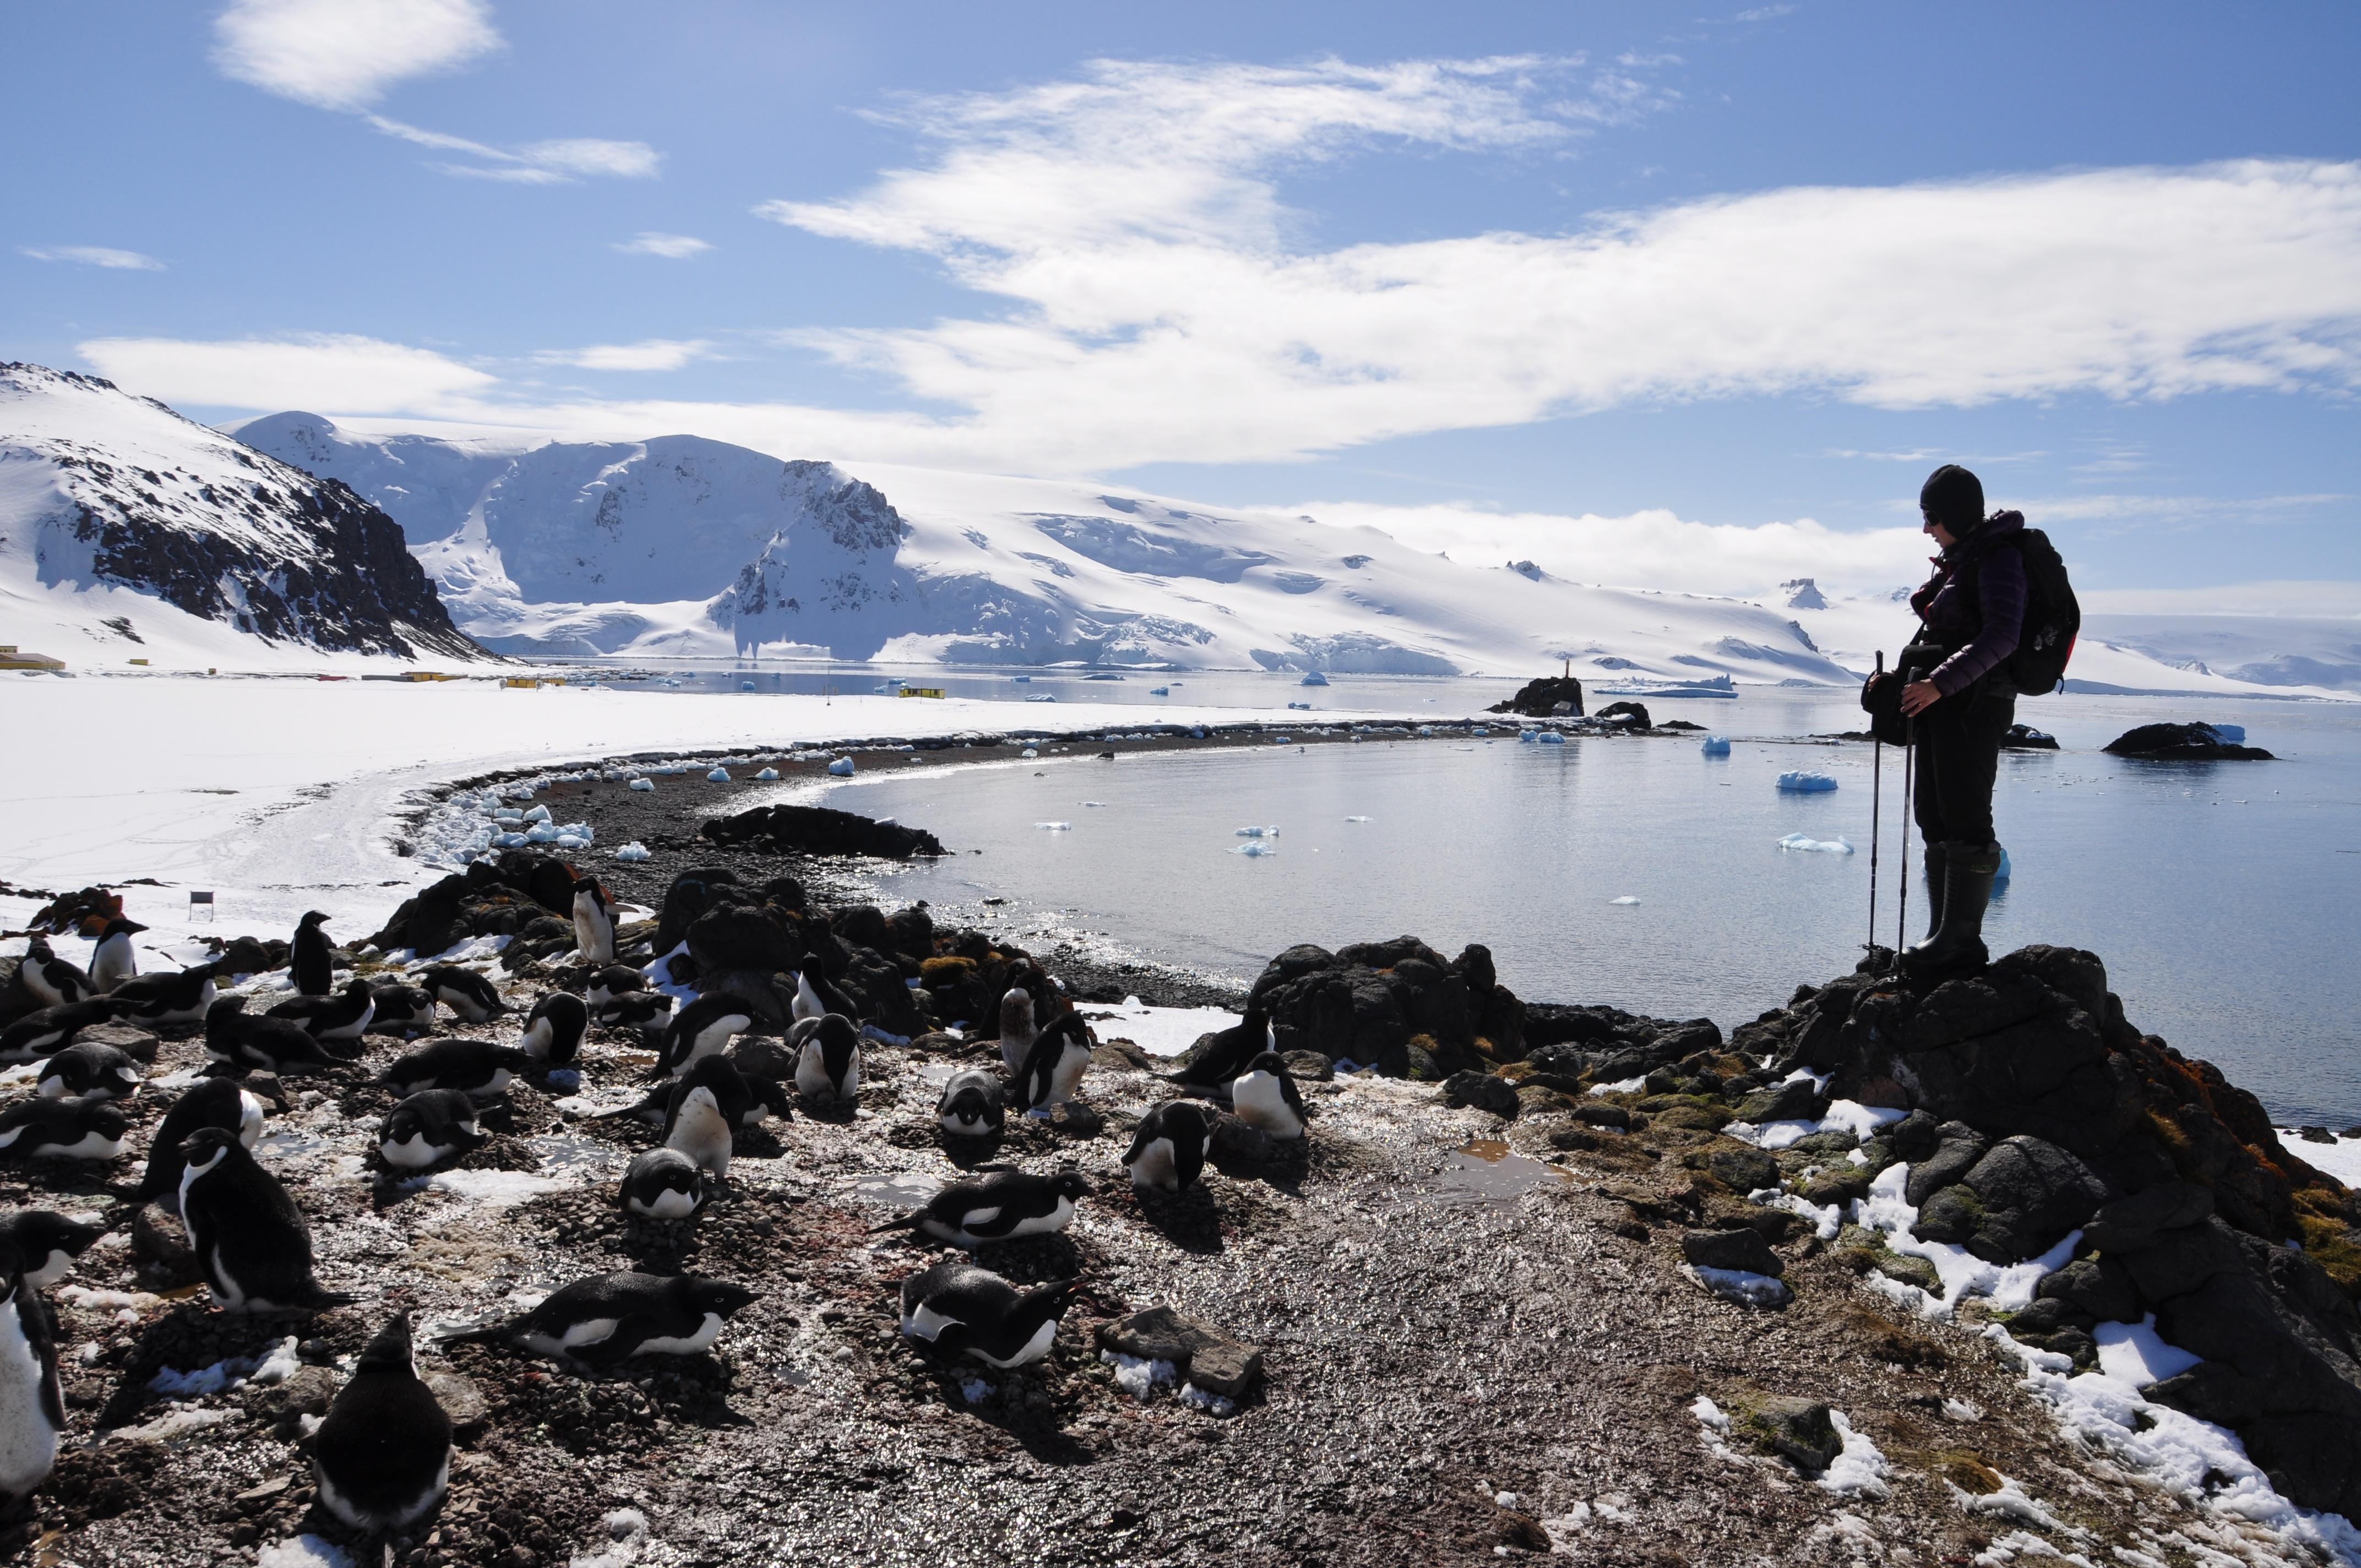 Obserwacja pingwinów Adeli | Observation of Adélie penguin's